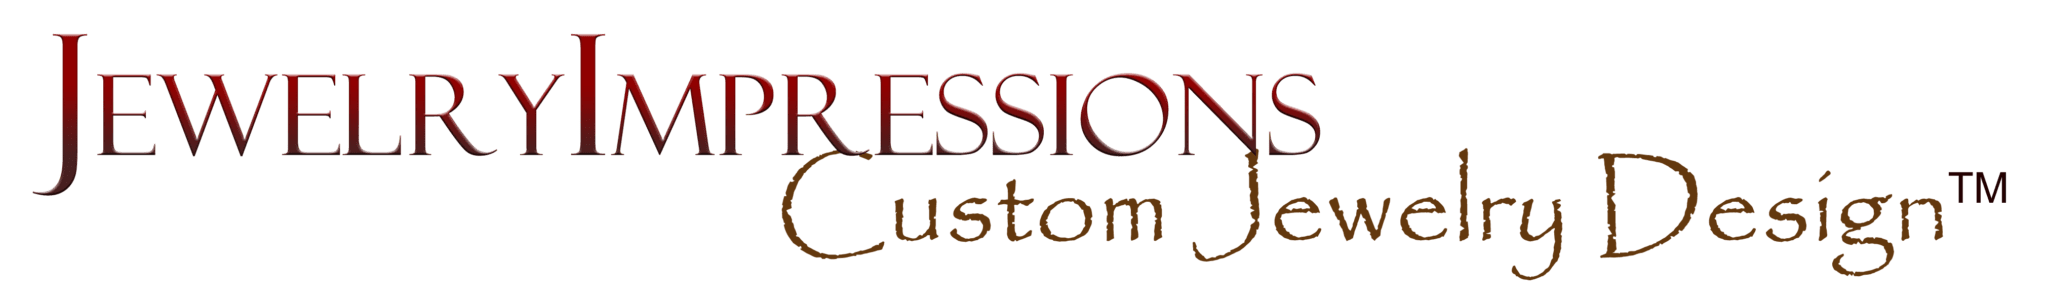 JewelryImpressions.com Custom Jewelry Design With Chatham-Created Gems and Lab-Grown Diamonds